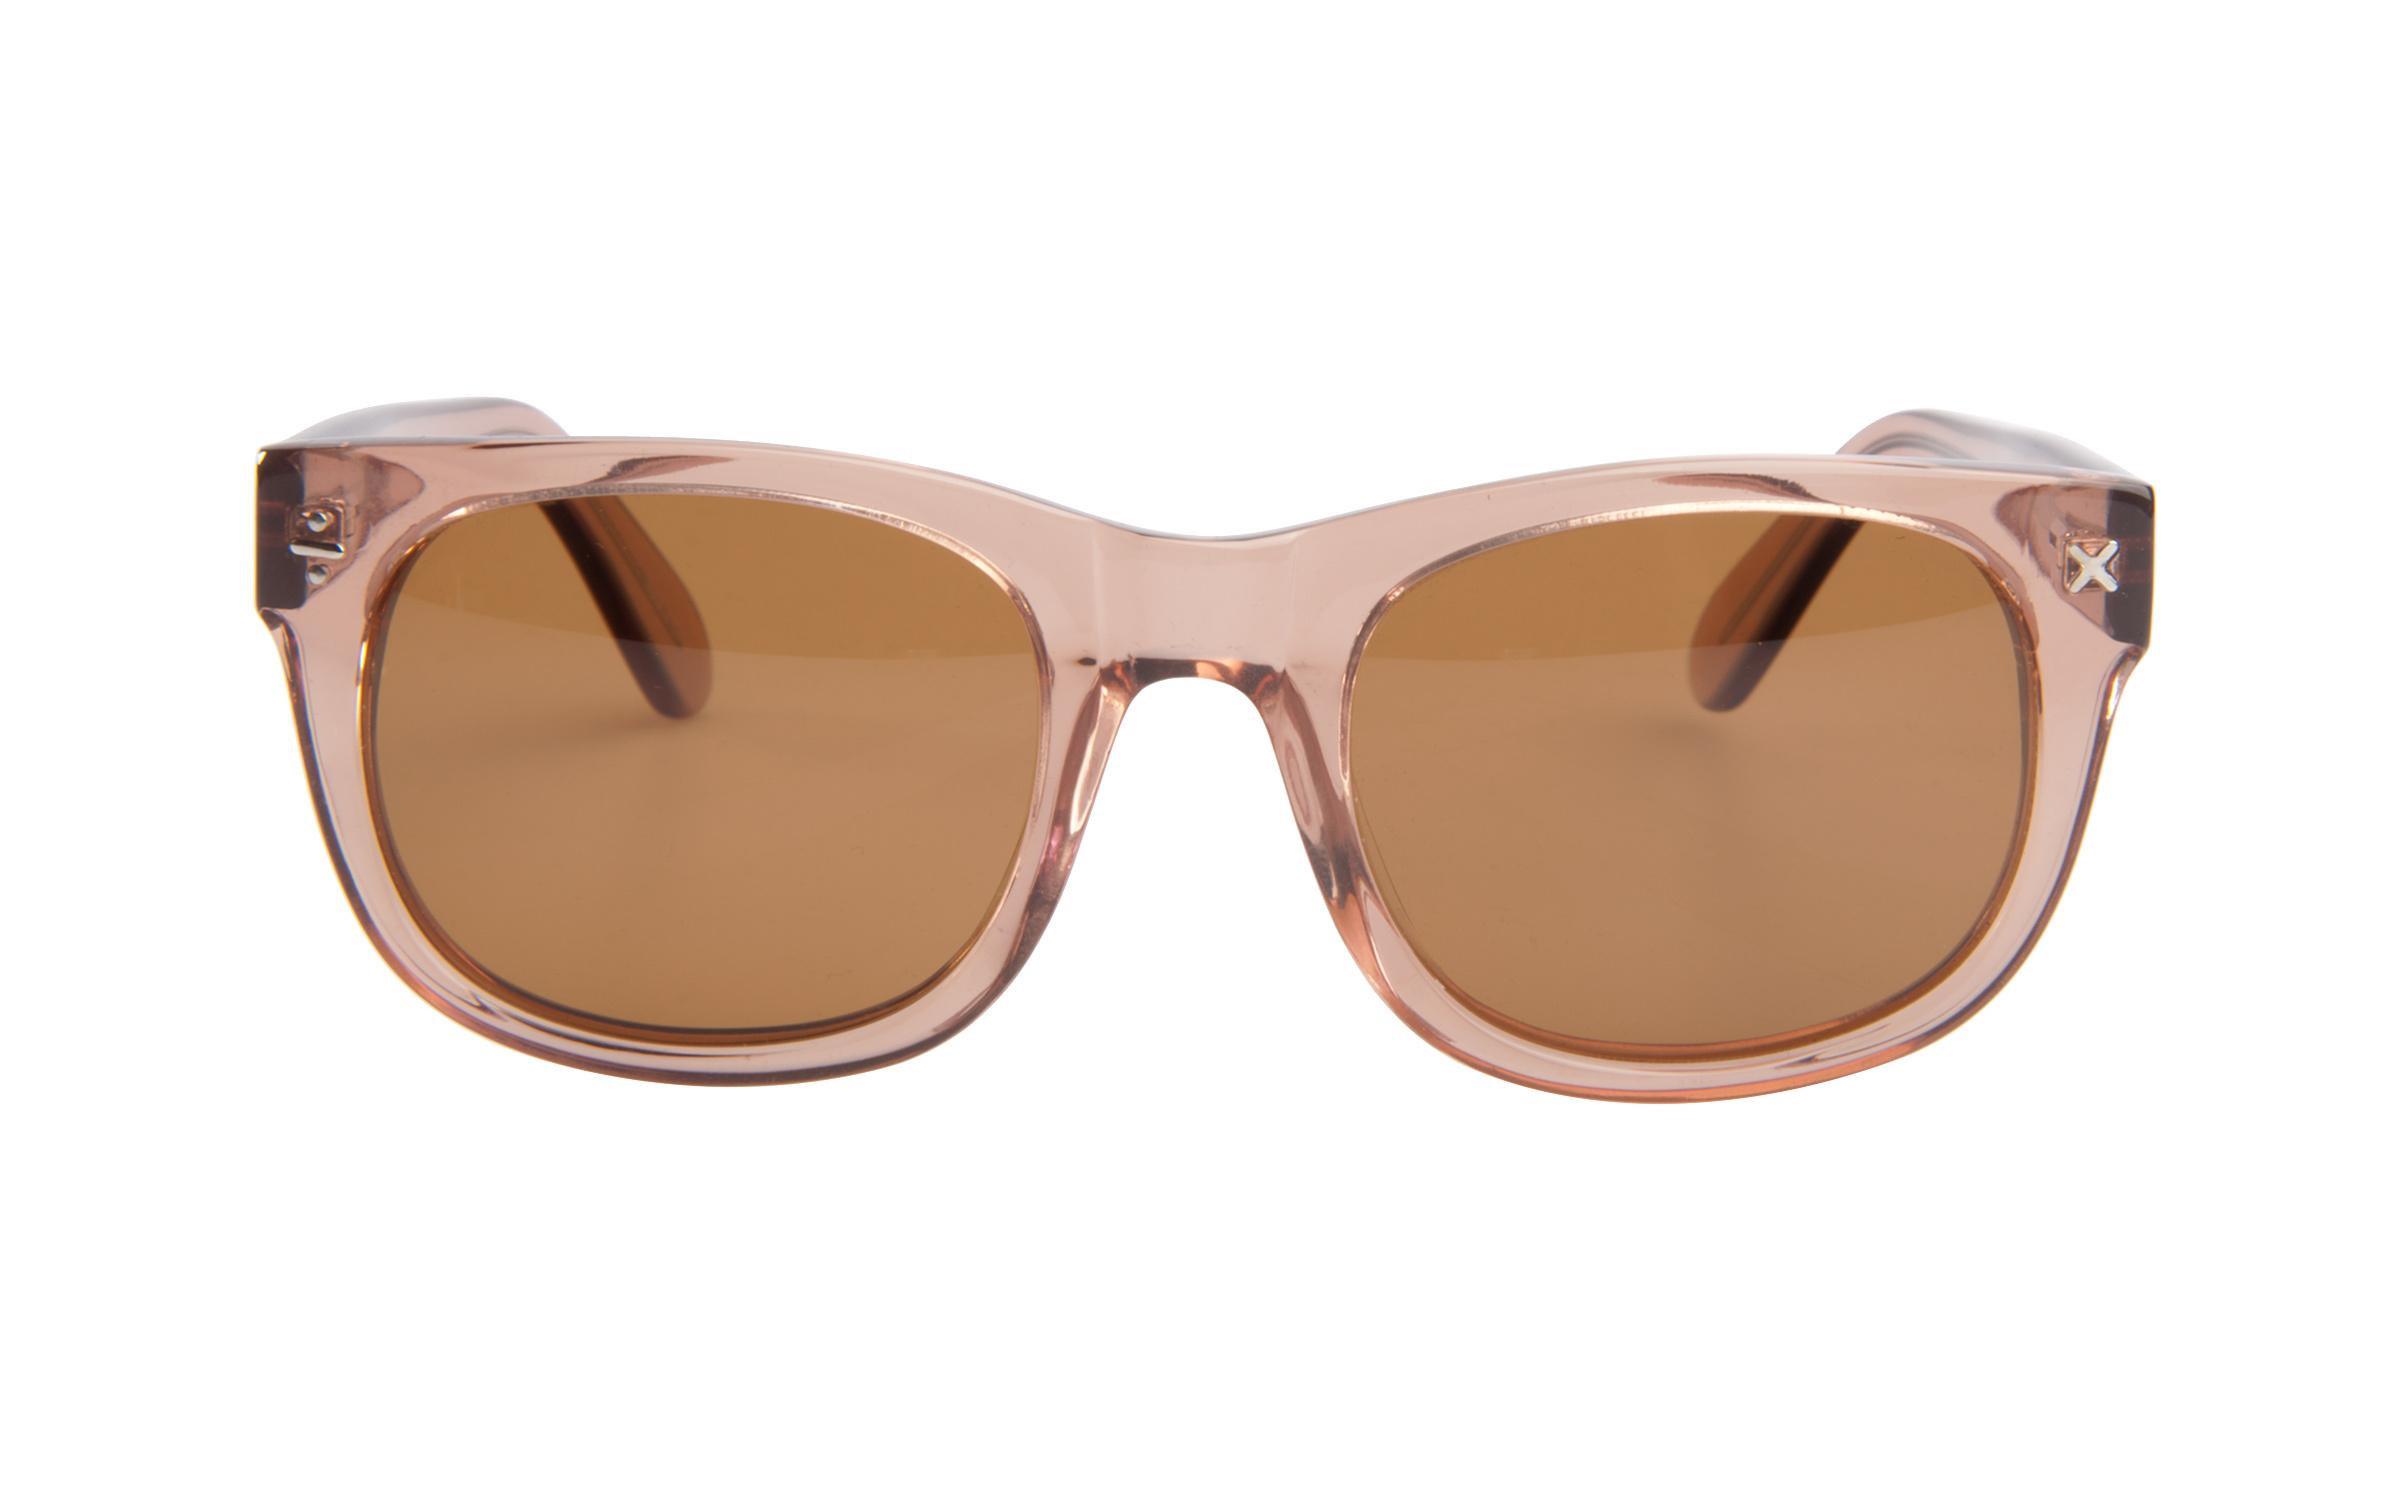 Retro_Sunglasses_Brown_Derek_Cardigan_Online_Coastal